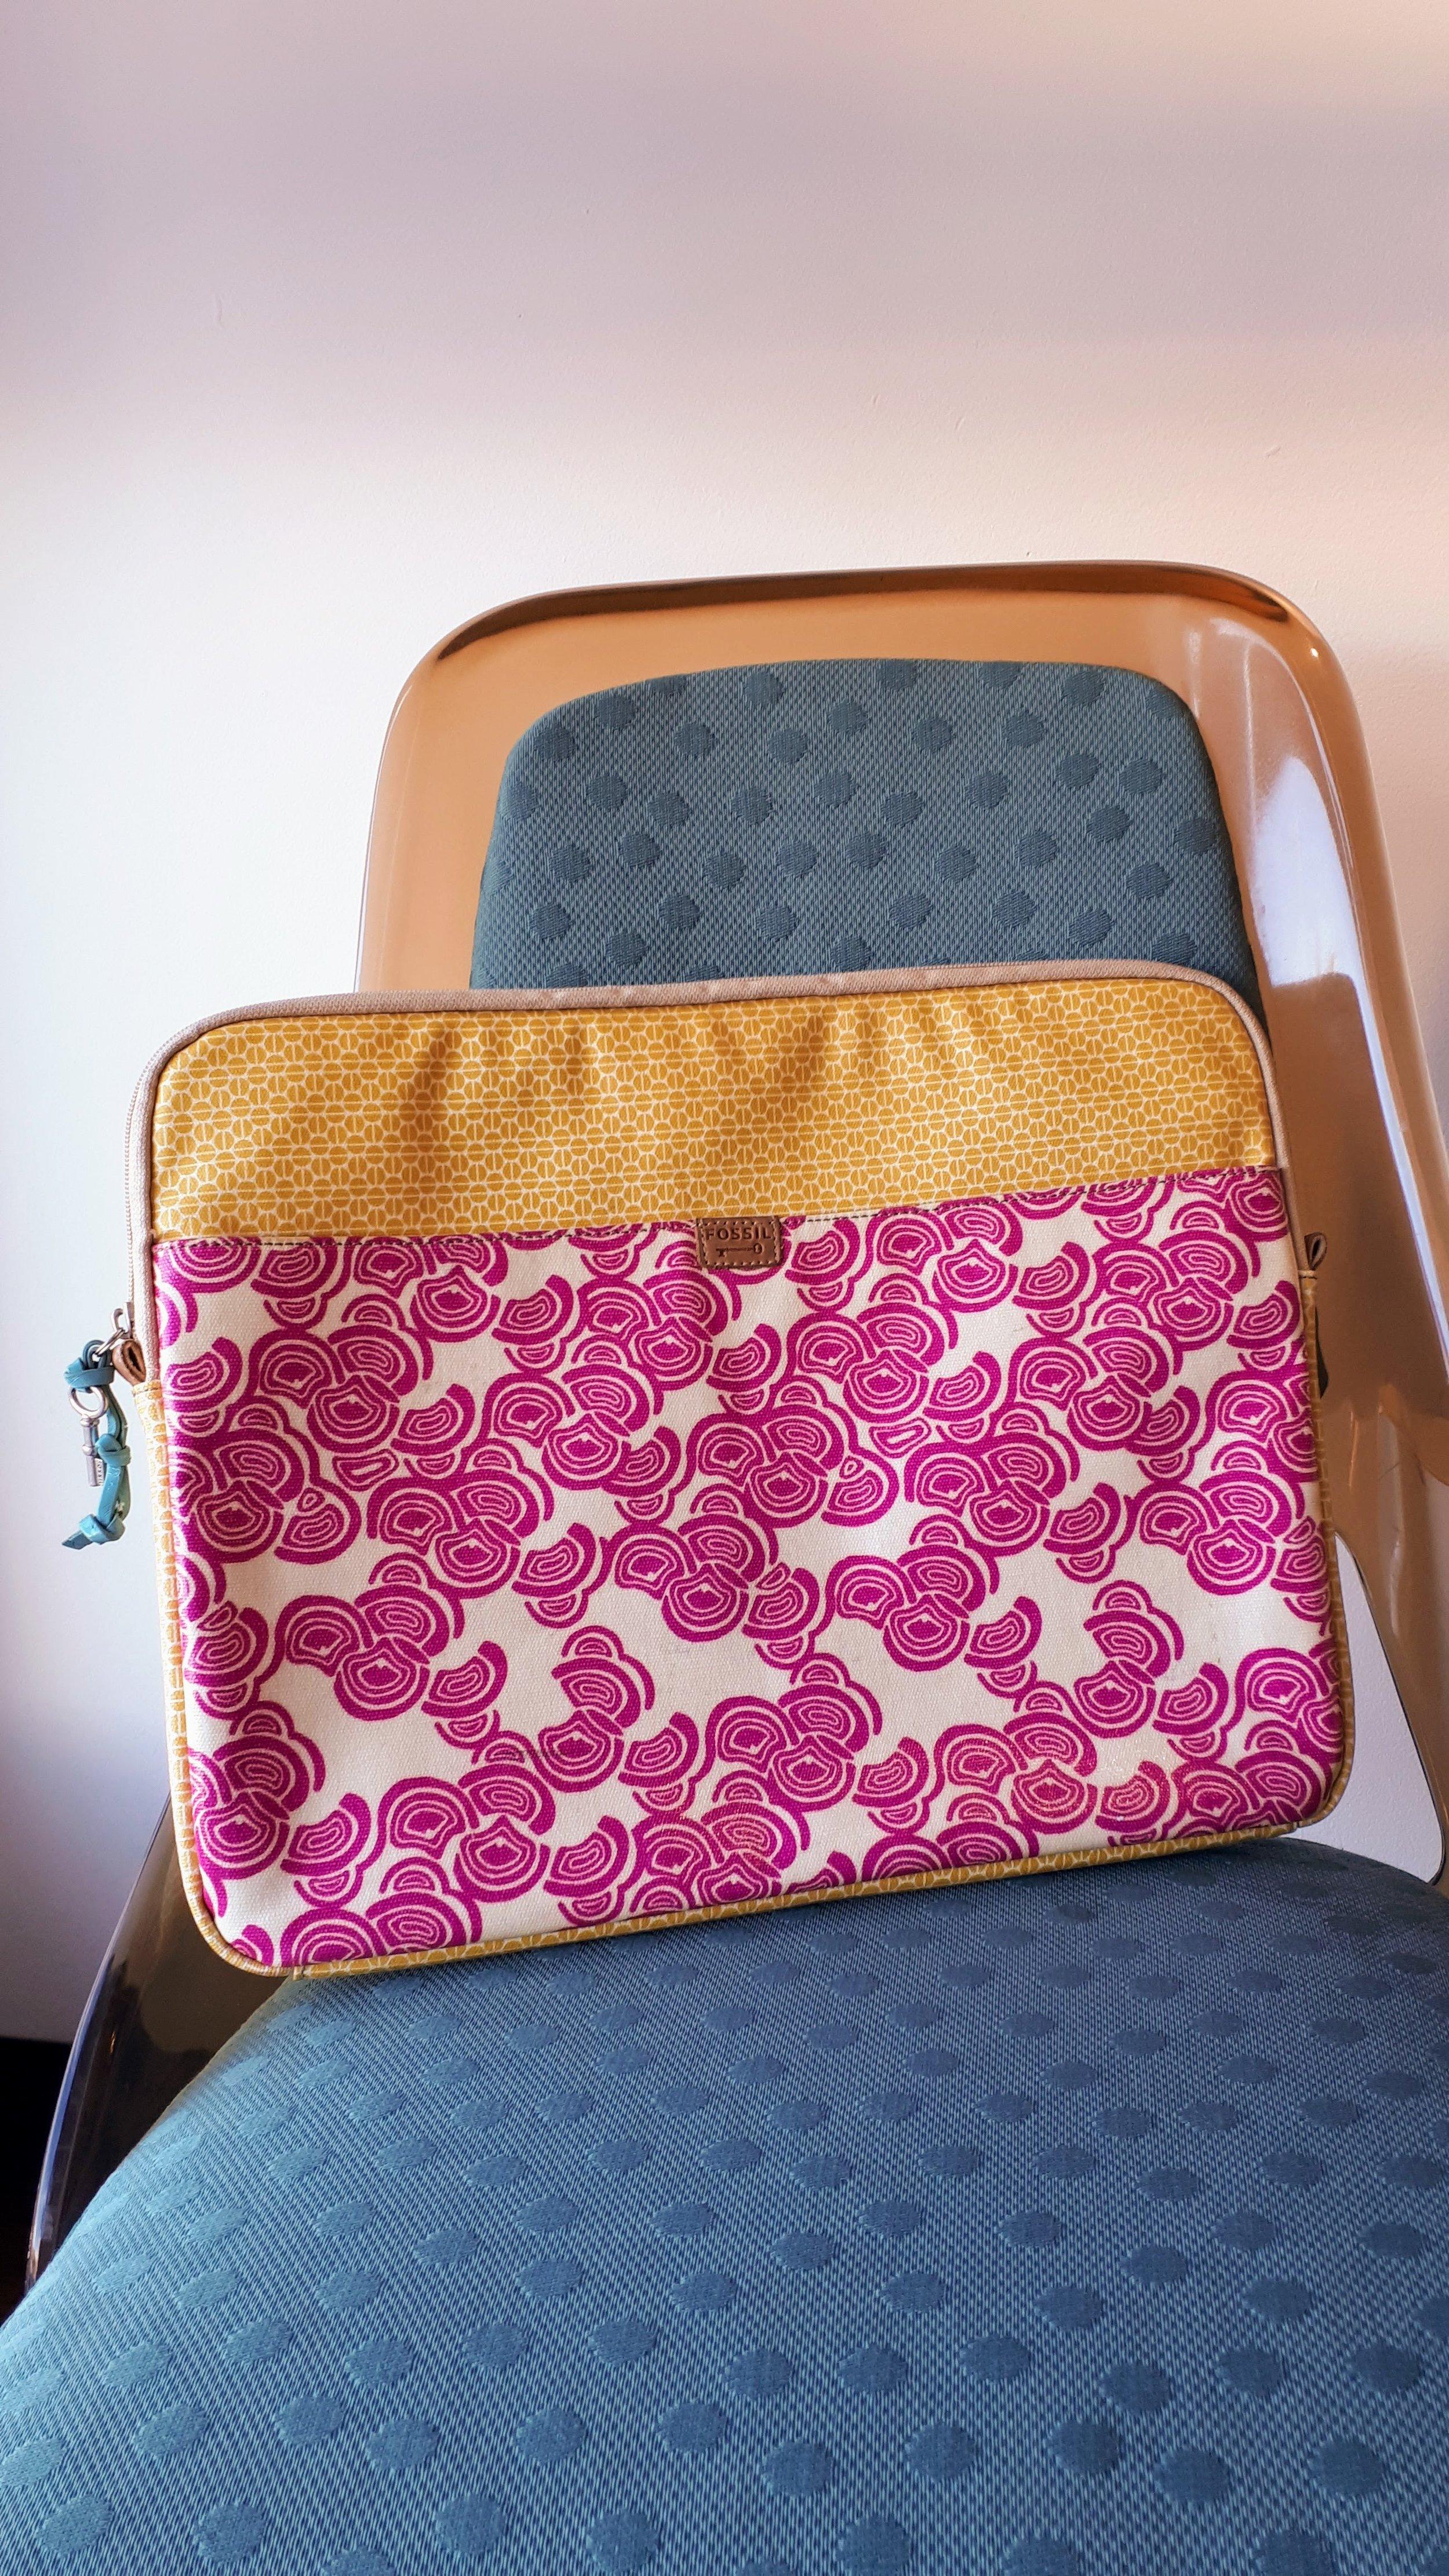 Fossil laptop bag, $42